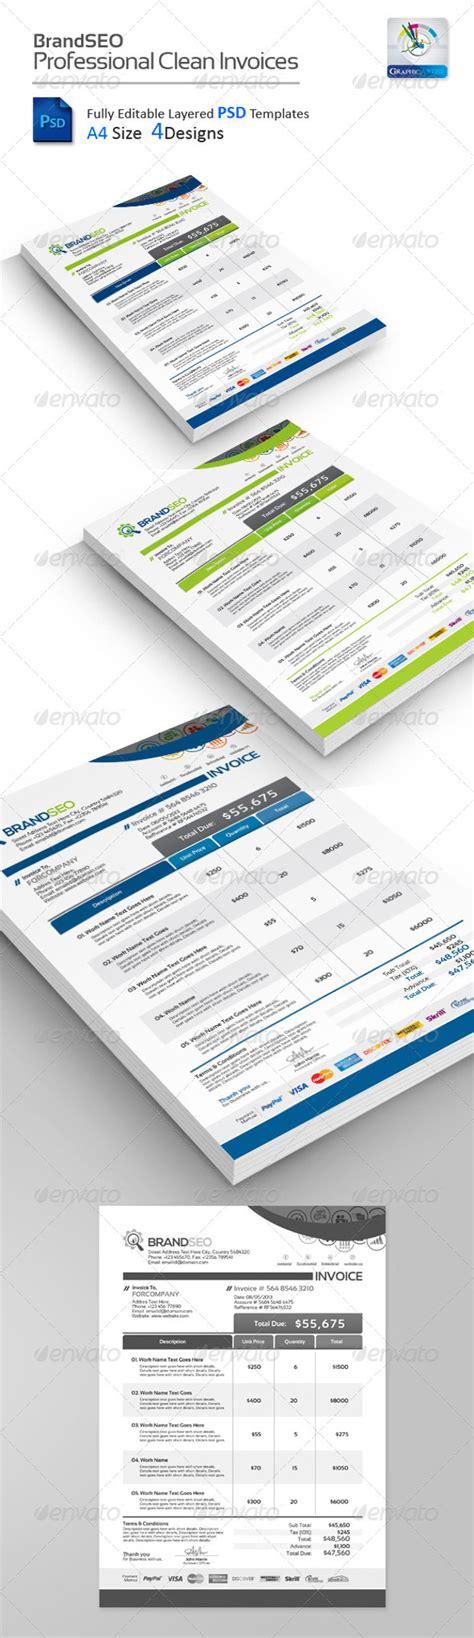 graphic design invoice psd 15 creative template psd download design trends